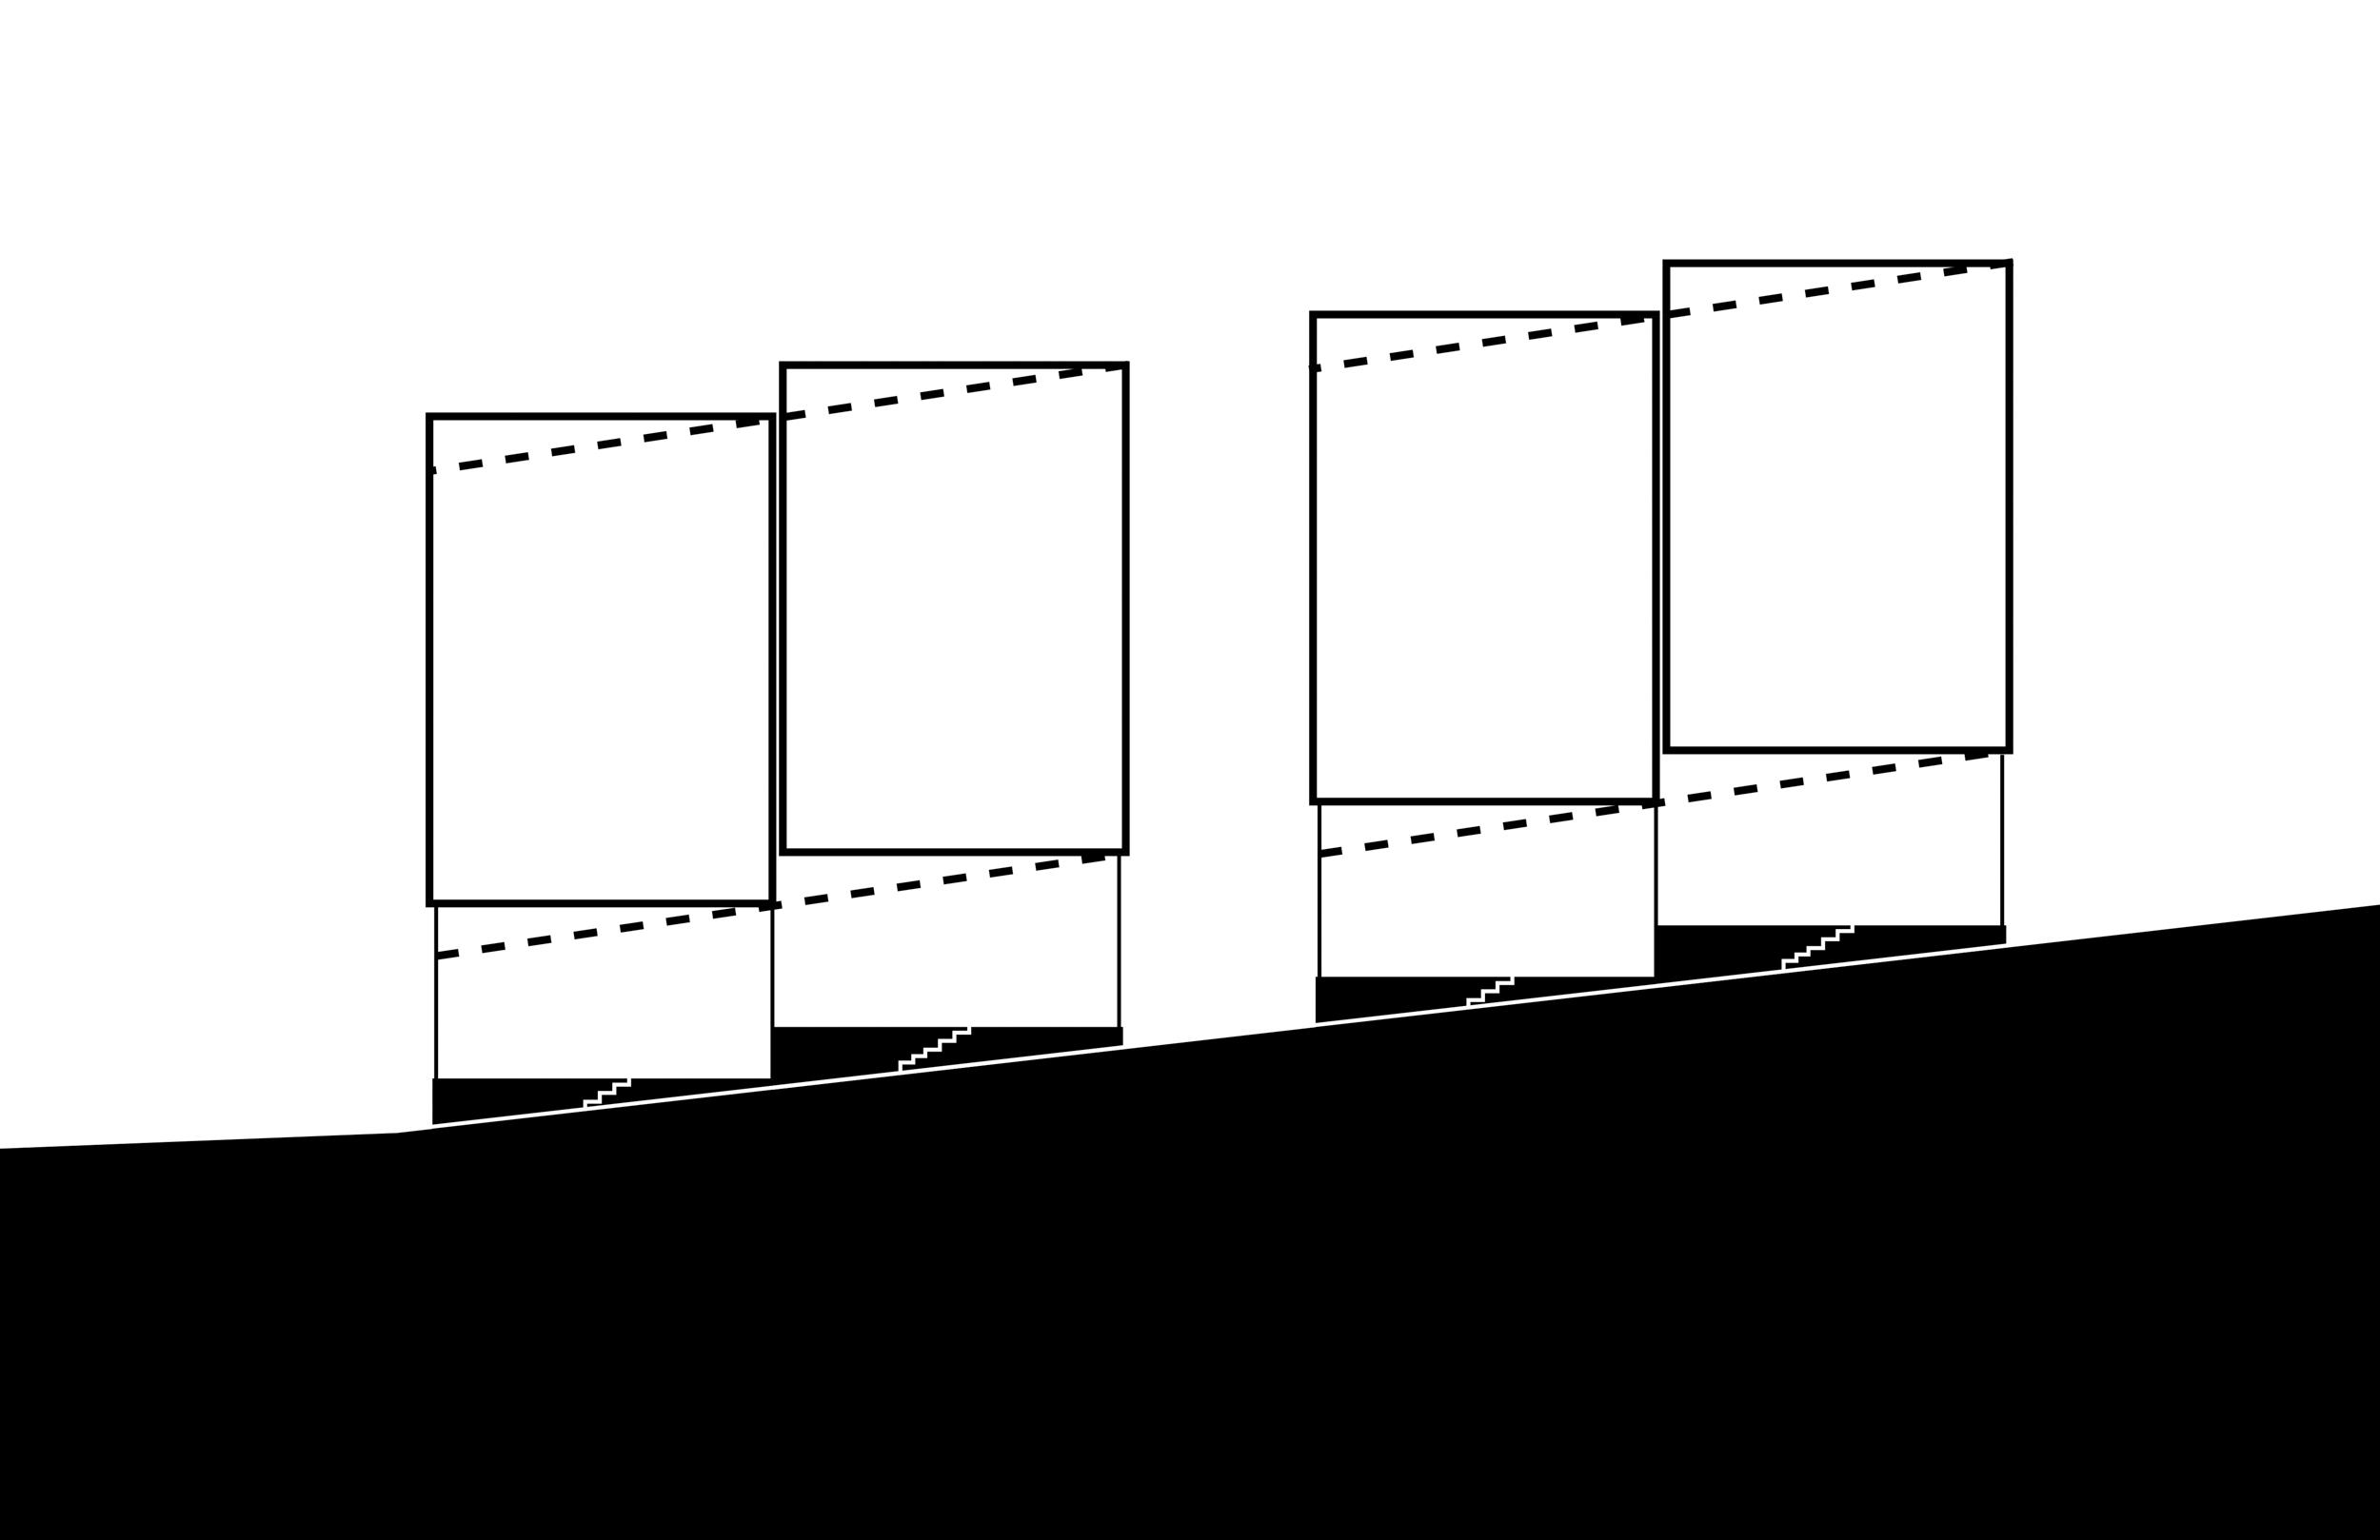 2302 G STREET - Diagram 4.jpg